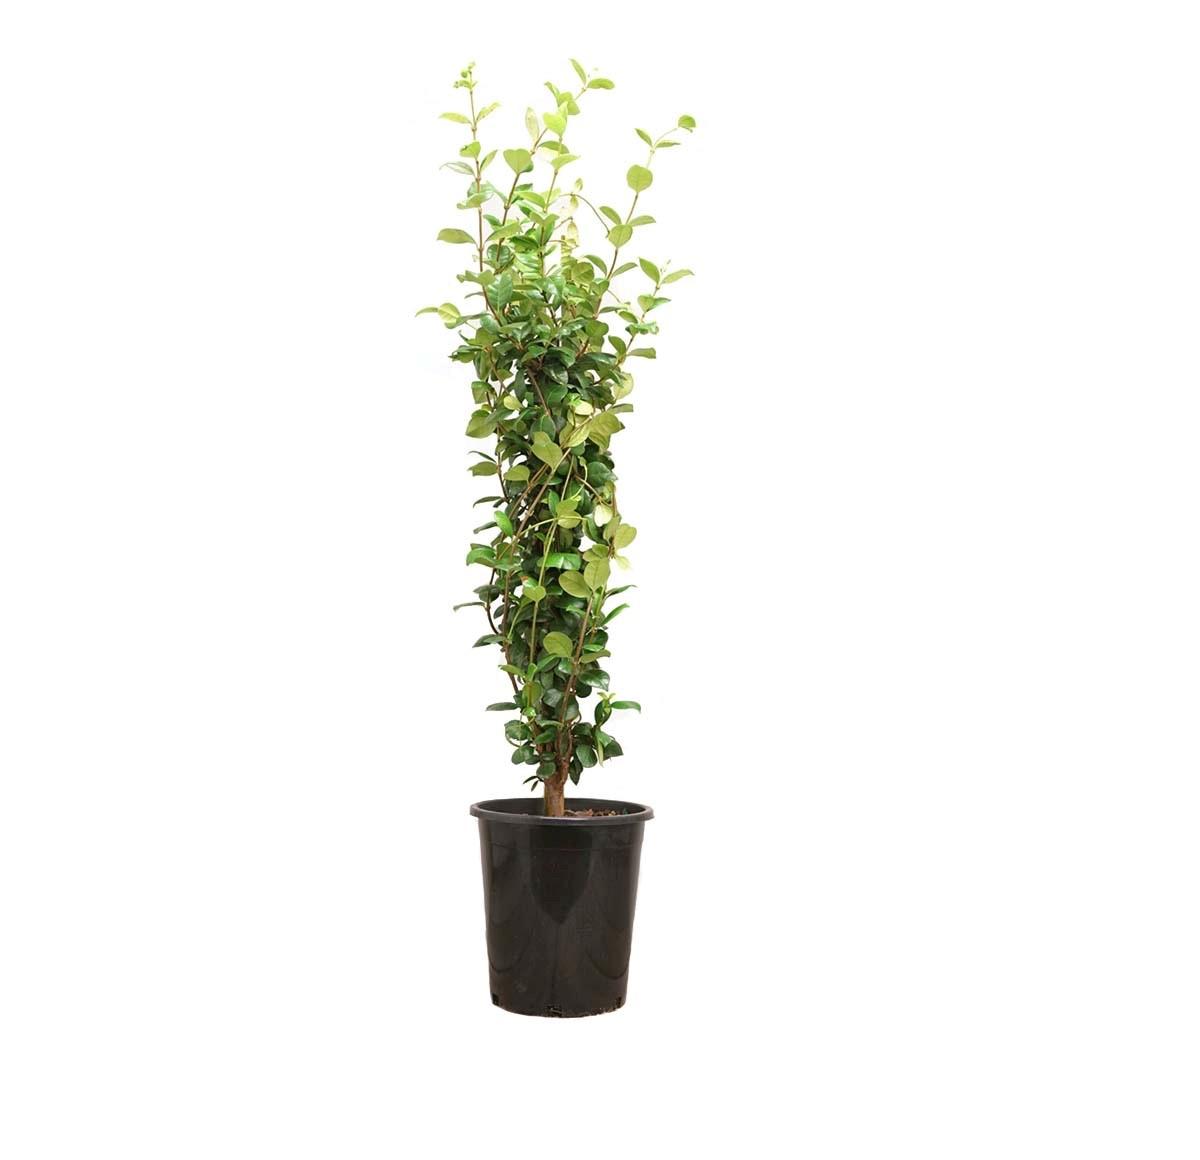 a single potted star jasmine staked, semi-tropical evergreen shrub